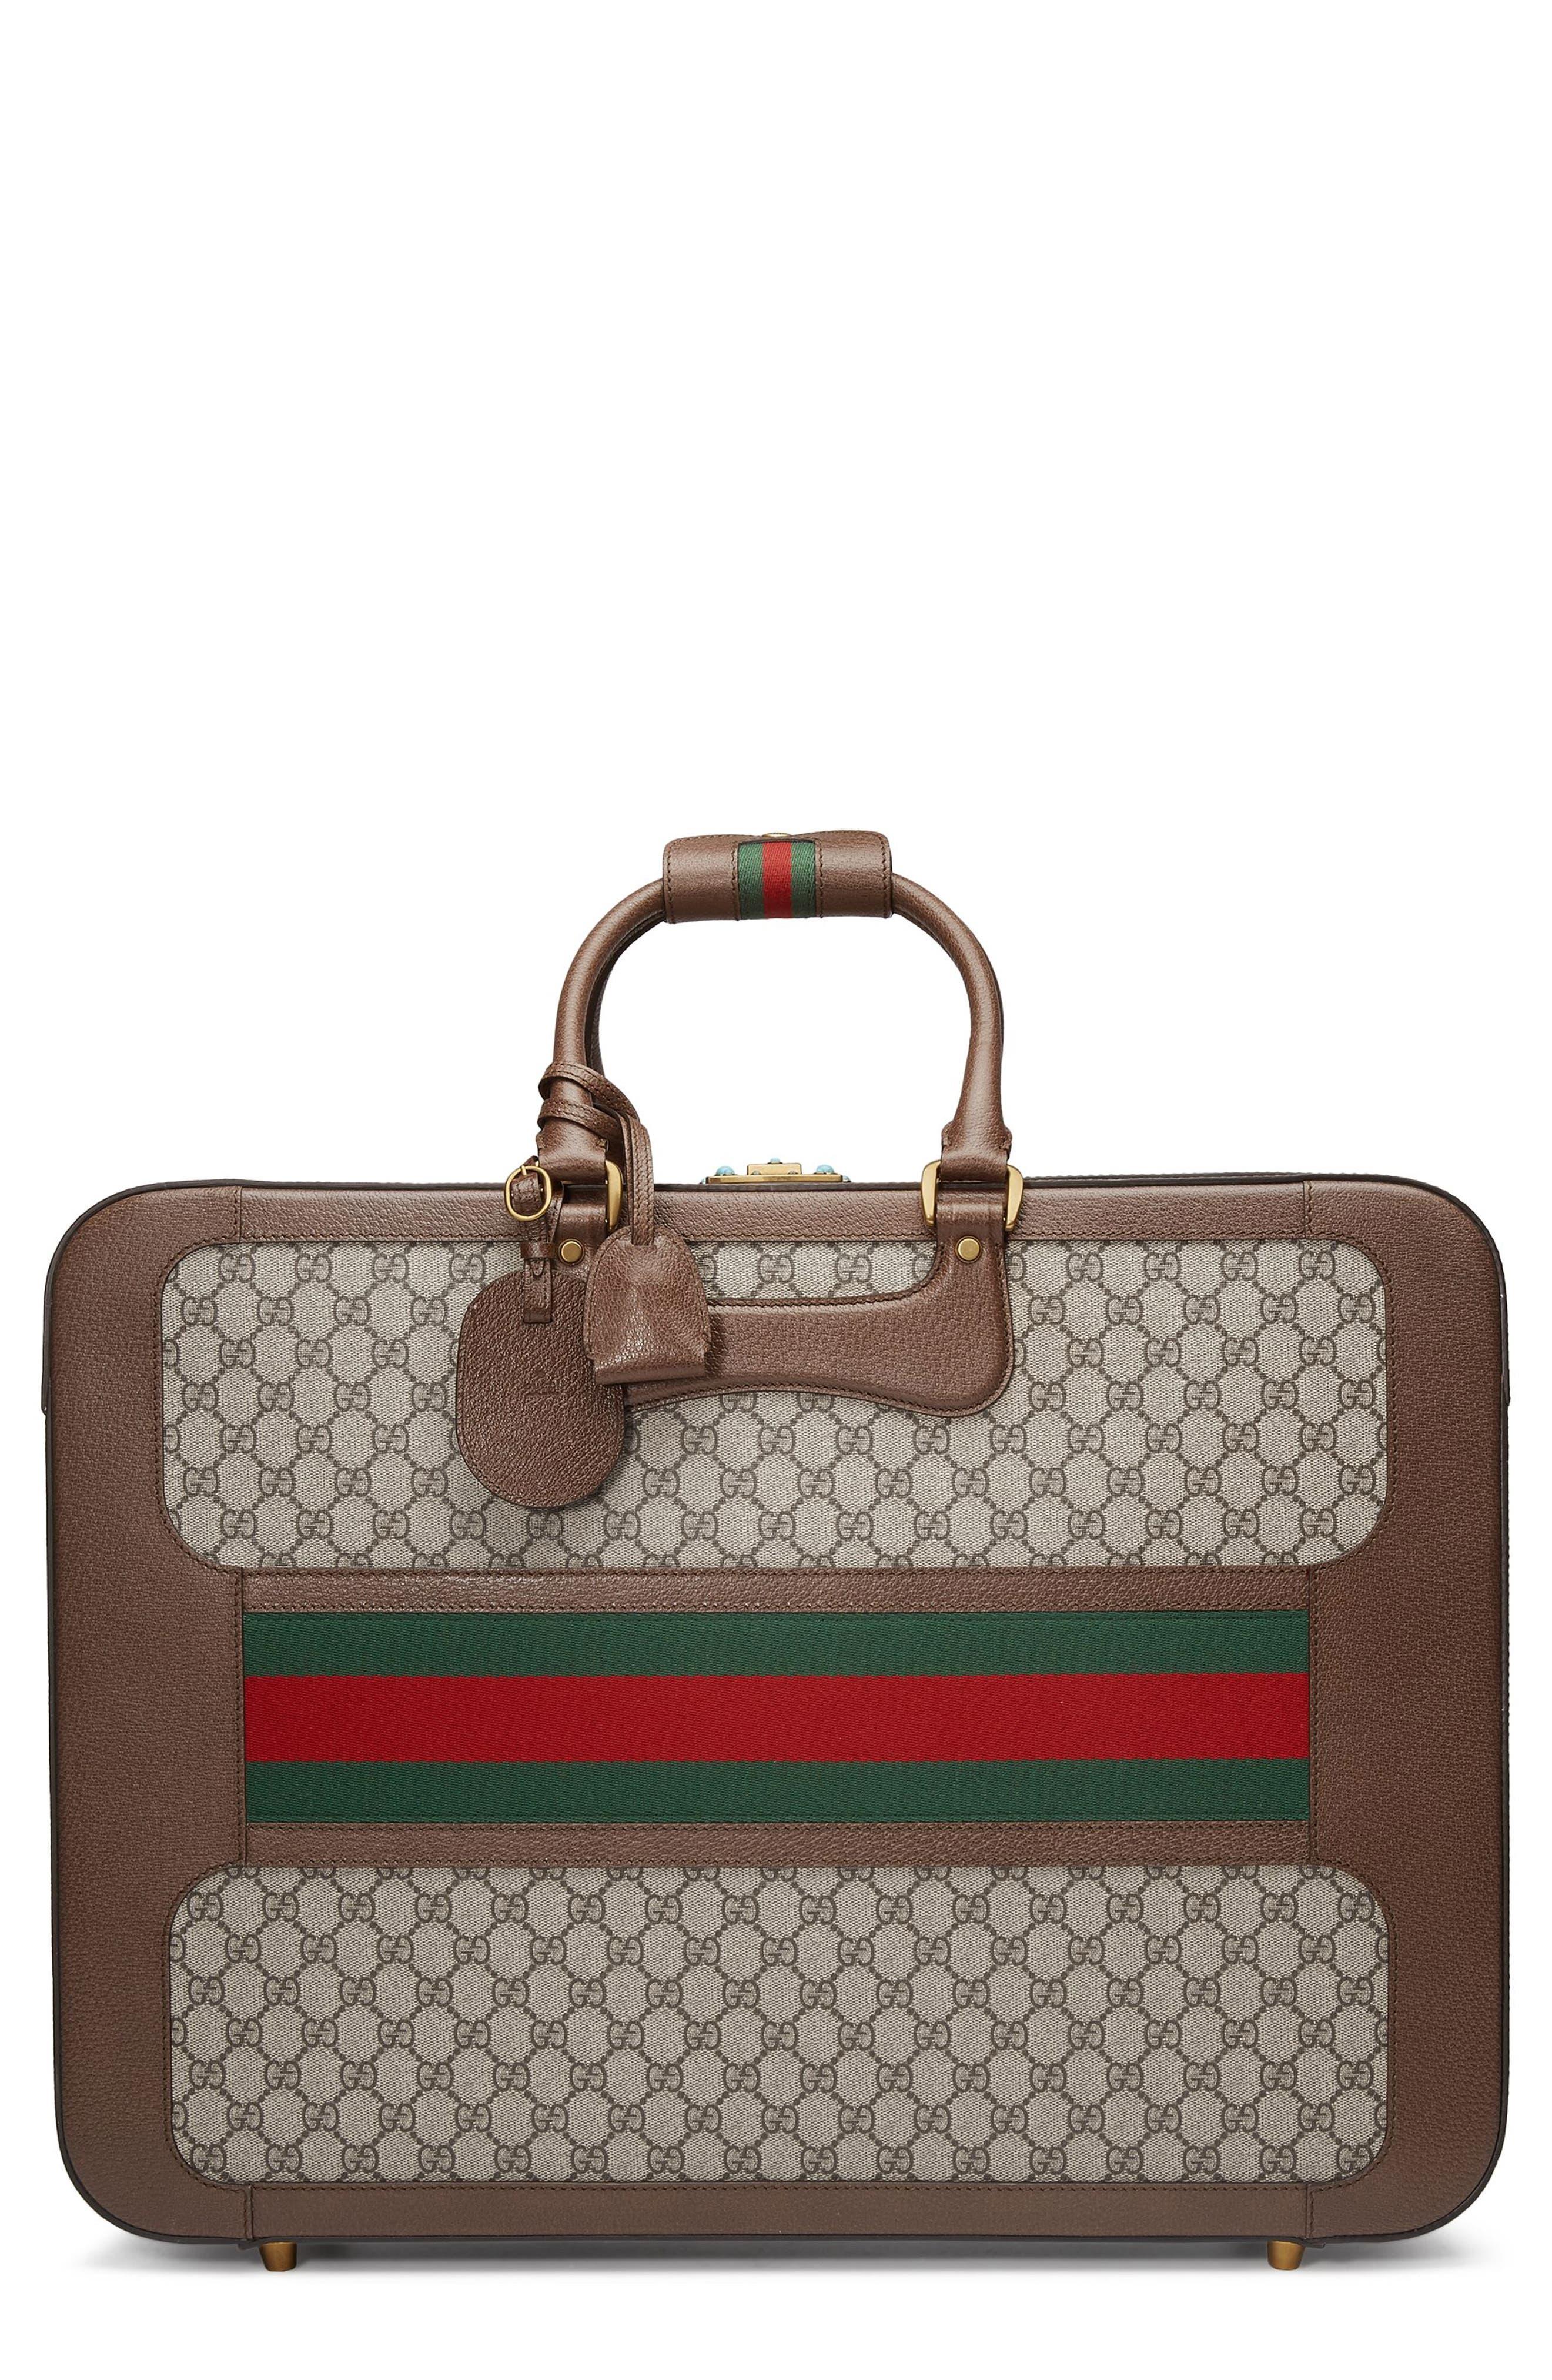 Large Echo GG Supreme Canvas & Leather Suitcase,                             Main thumbnail 1, color,                             283